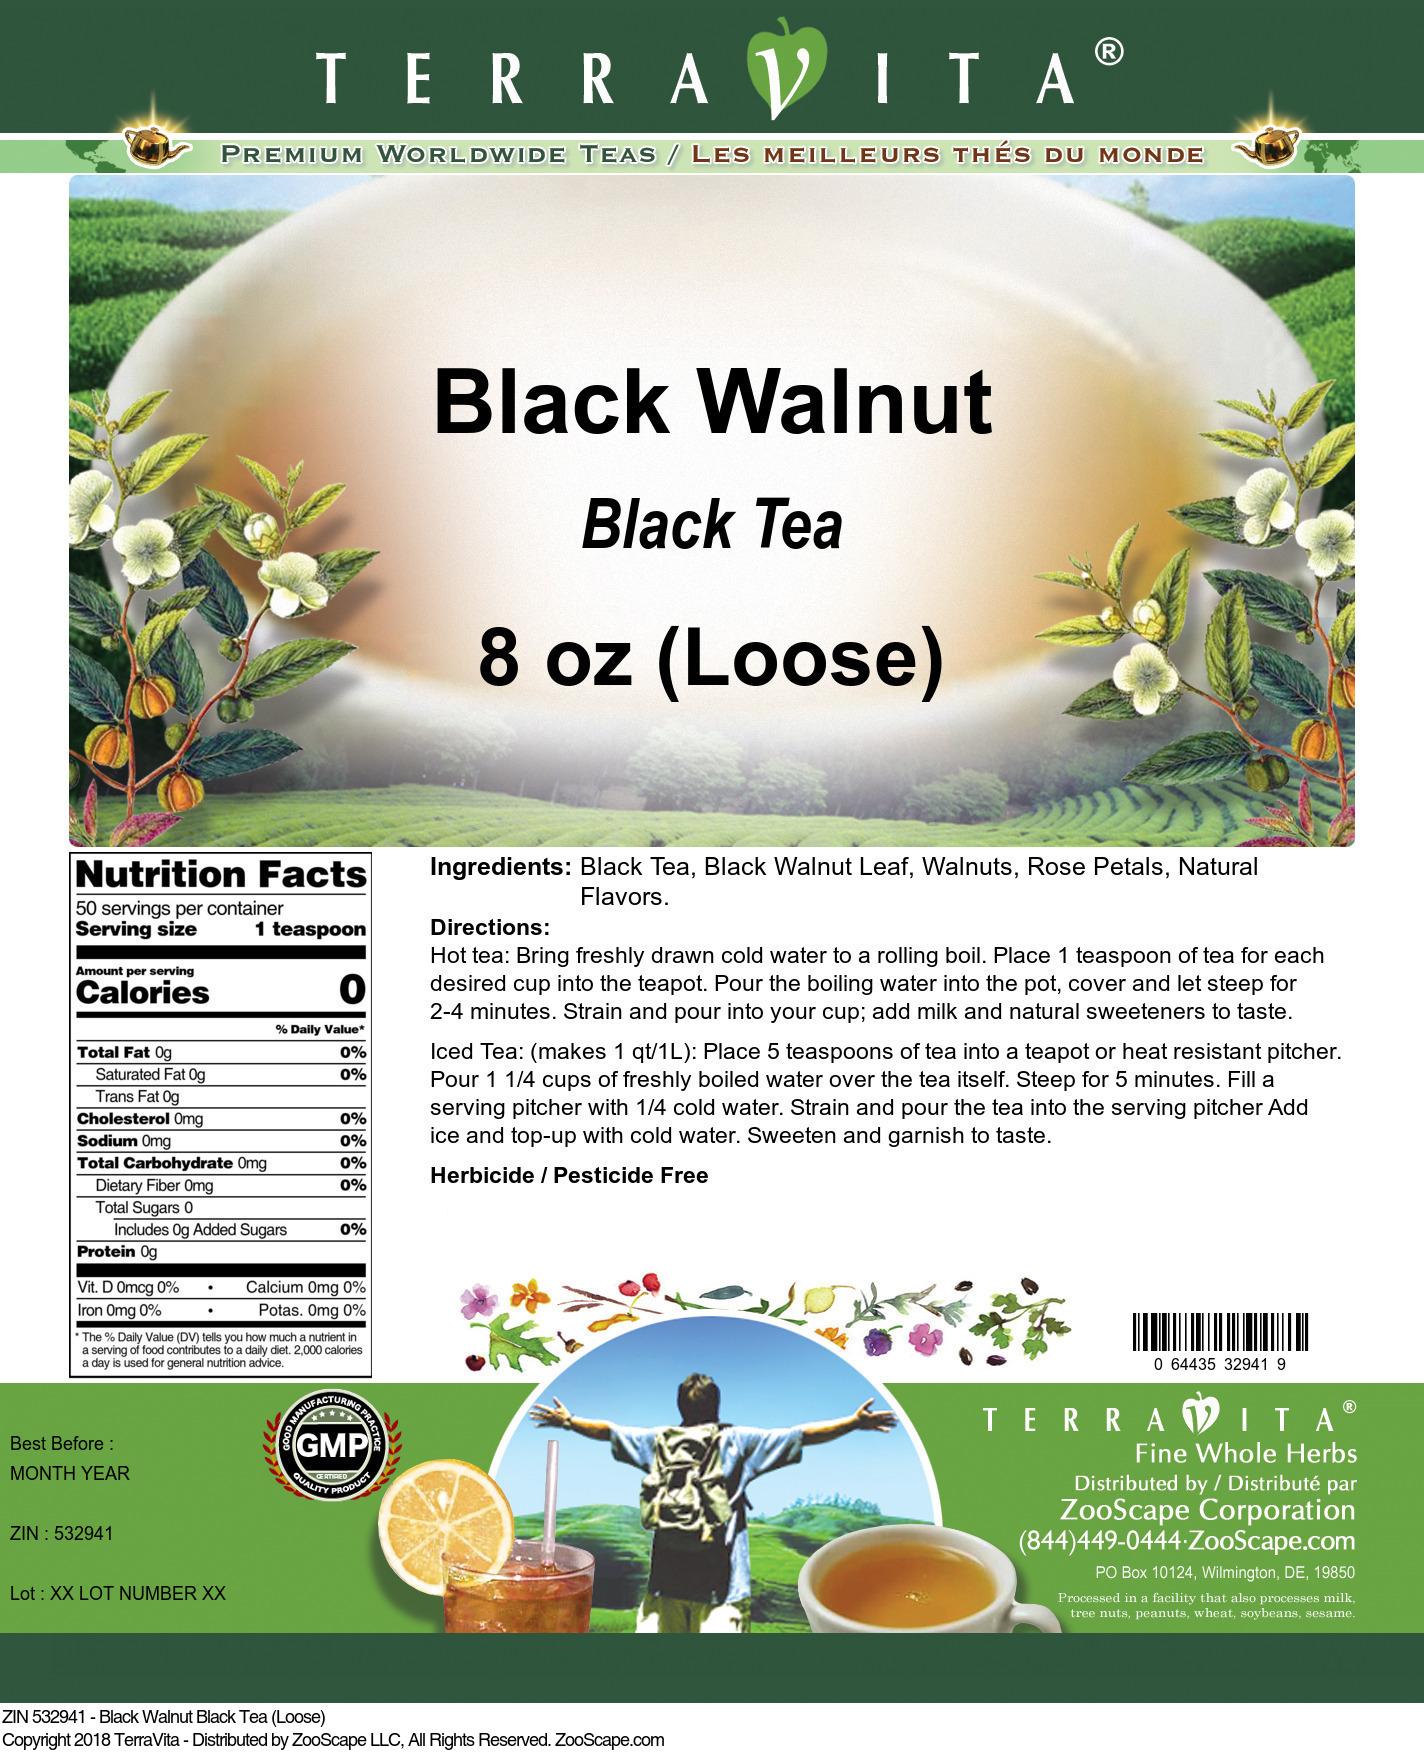 Black Walnut Black Tea